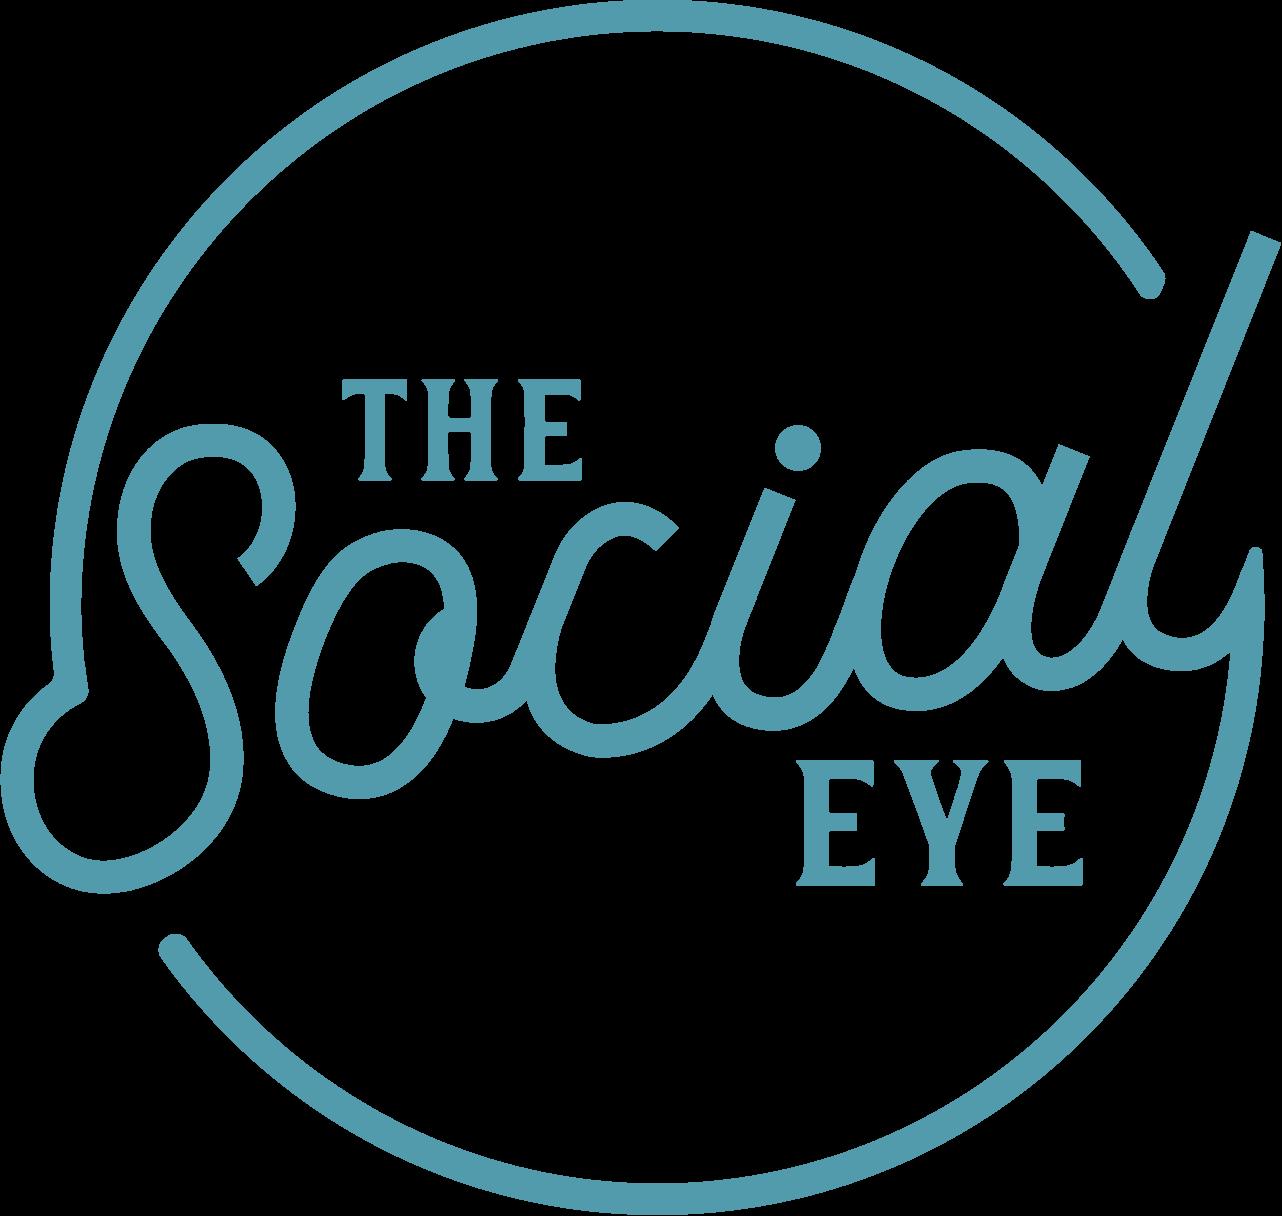 The Social Eye